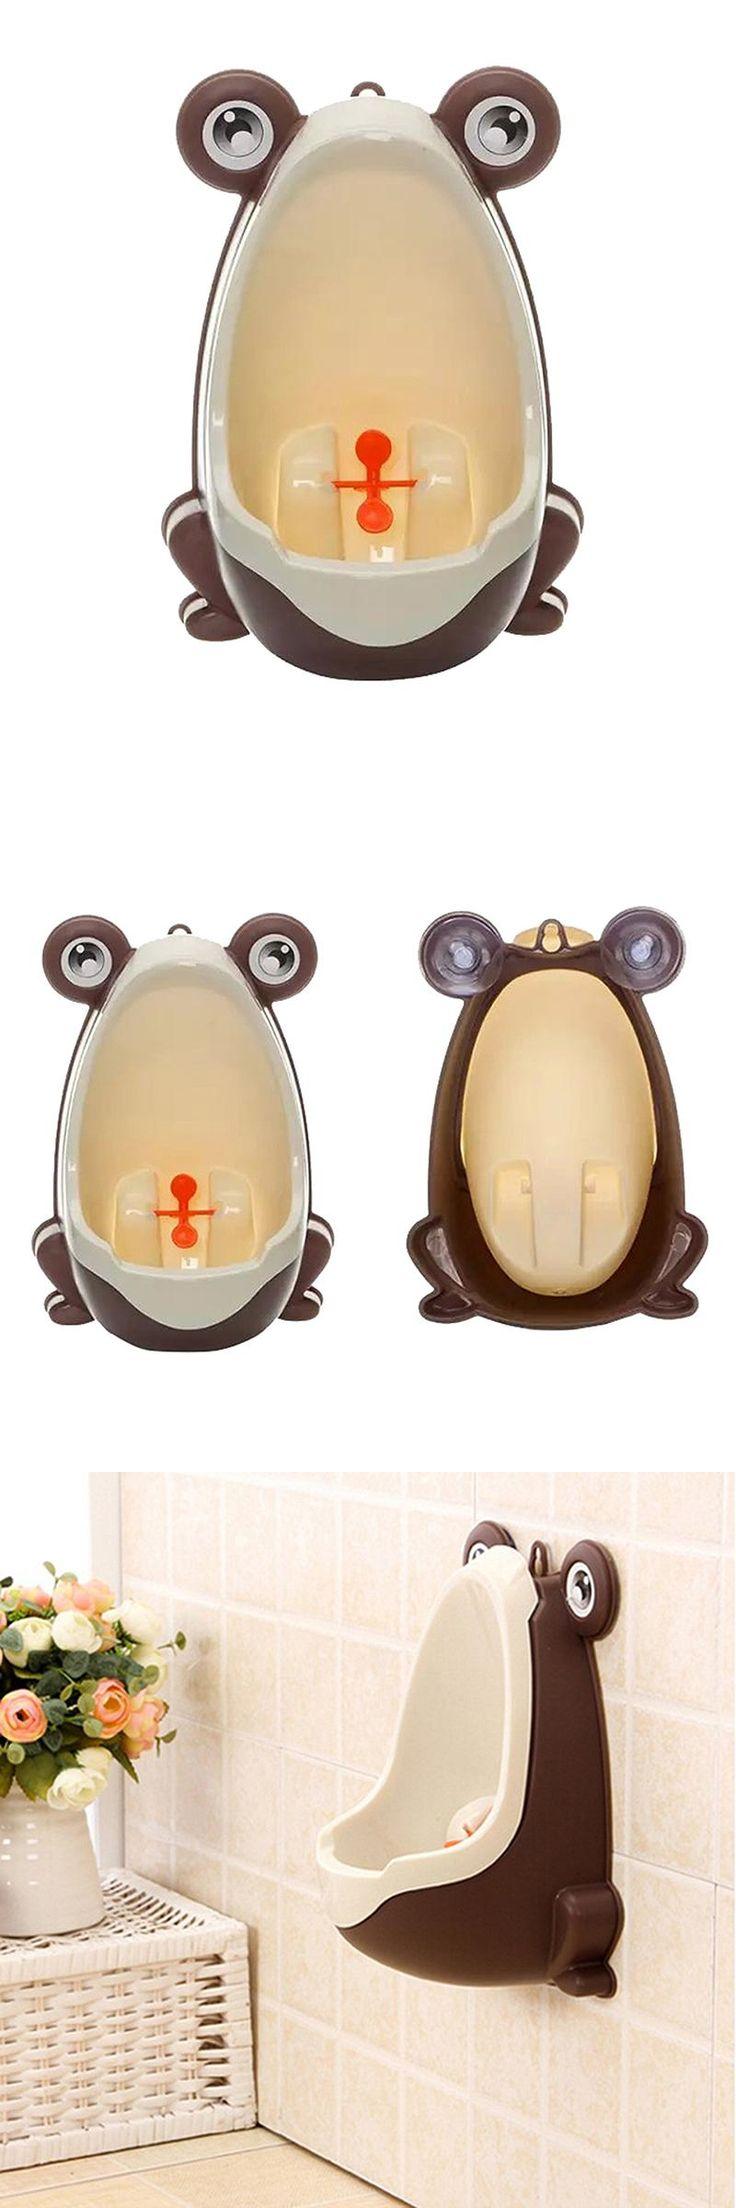 Frog bathroom set -  Visit To Buy New Frog Children Potty Toilet Training Kids Urinal For Boys Pee